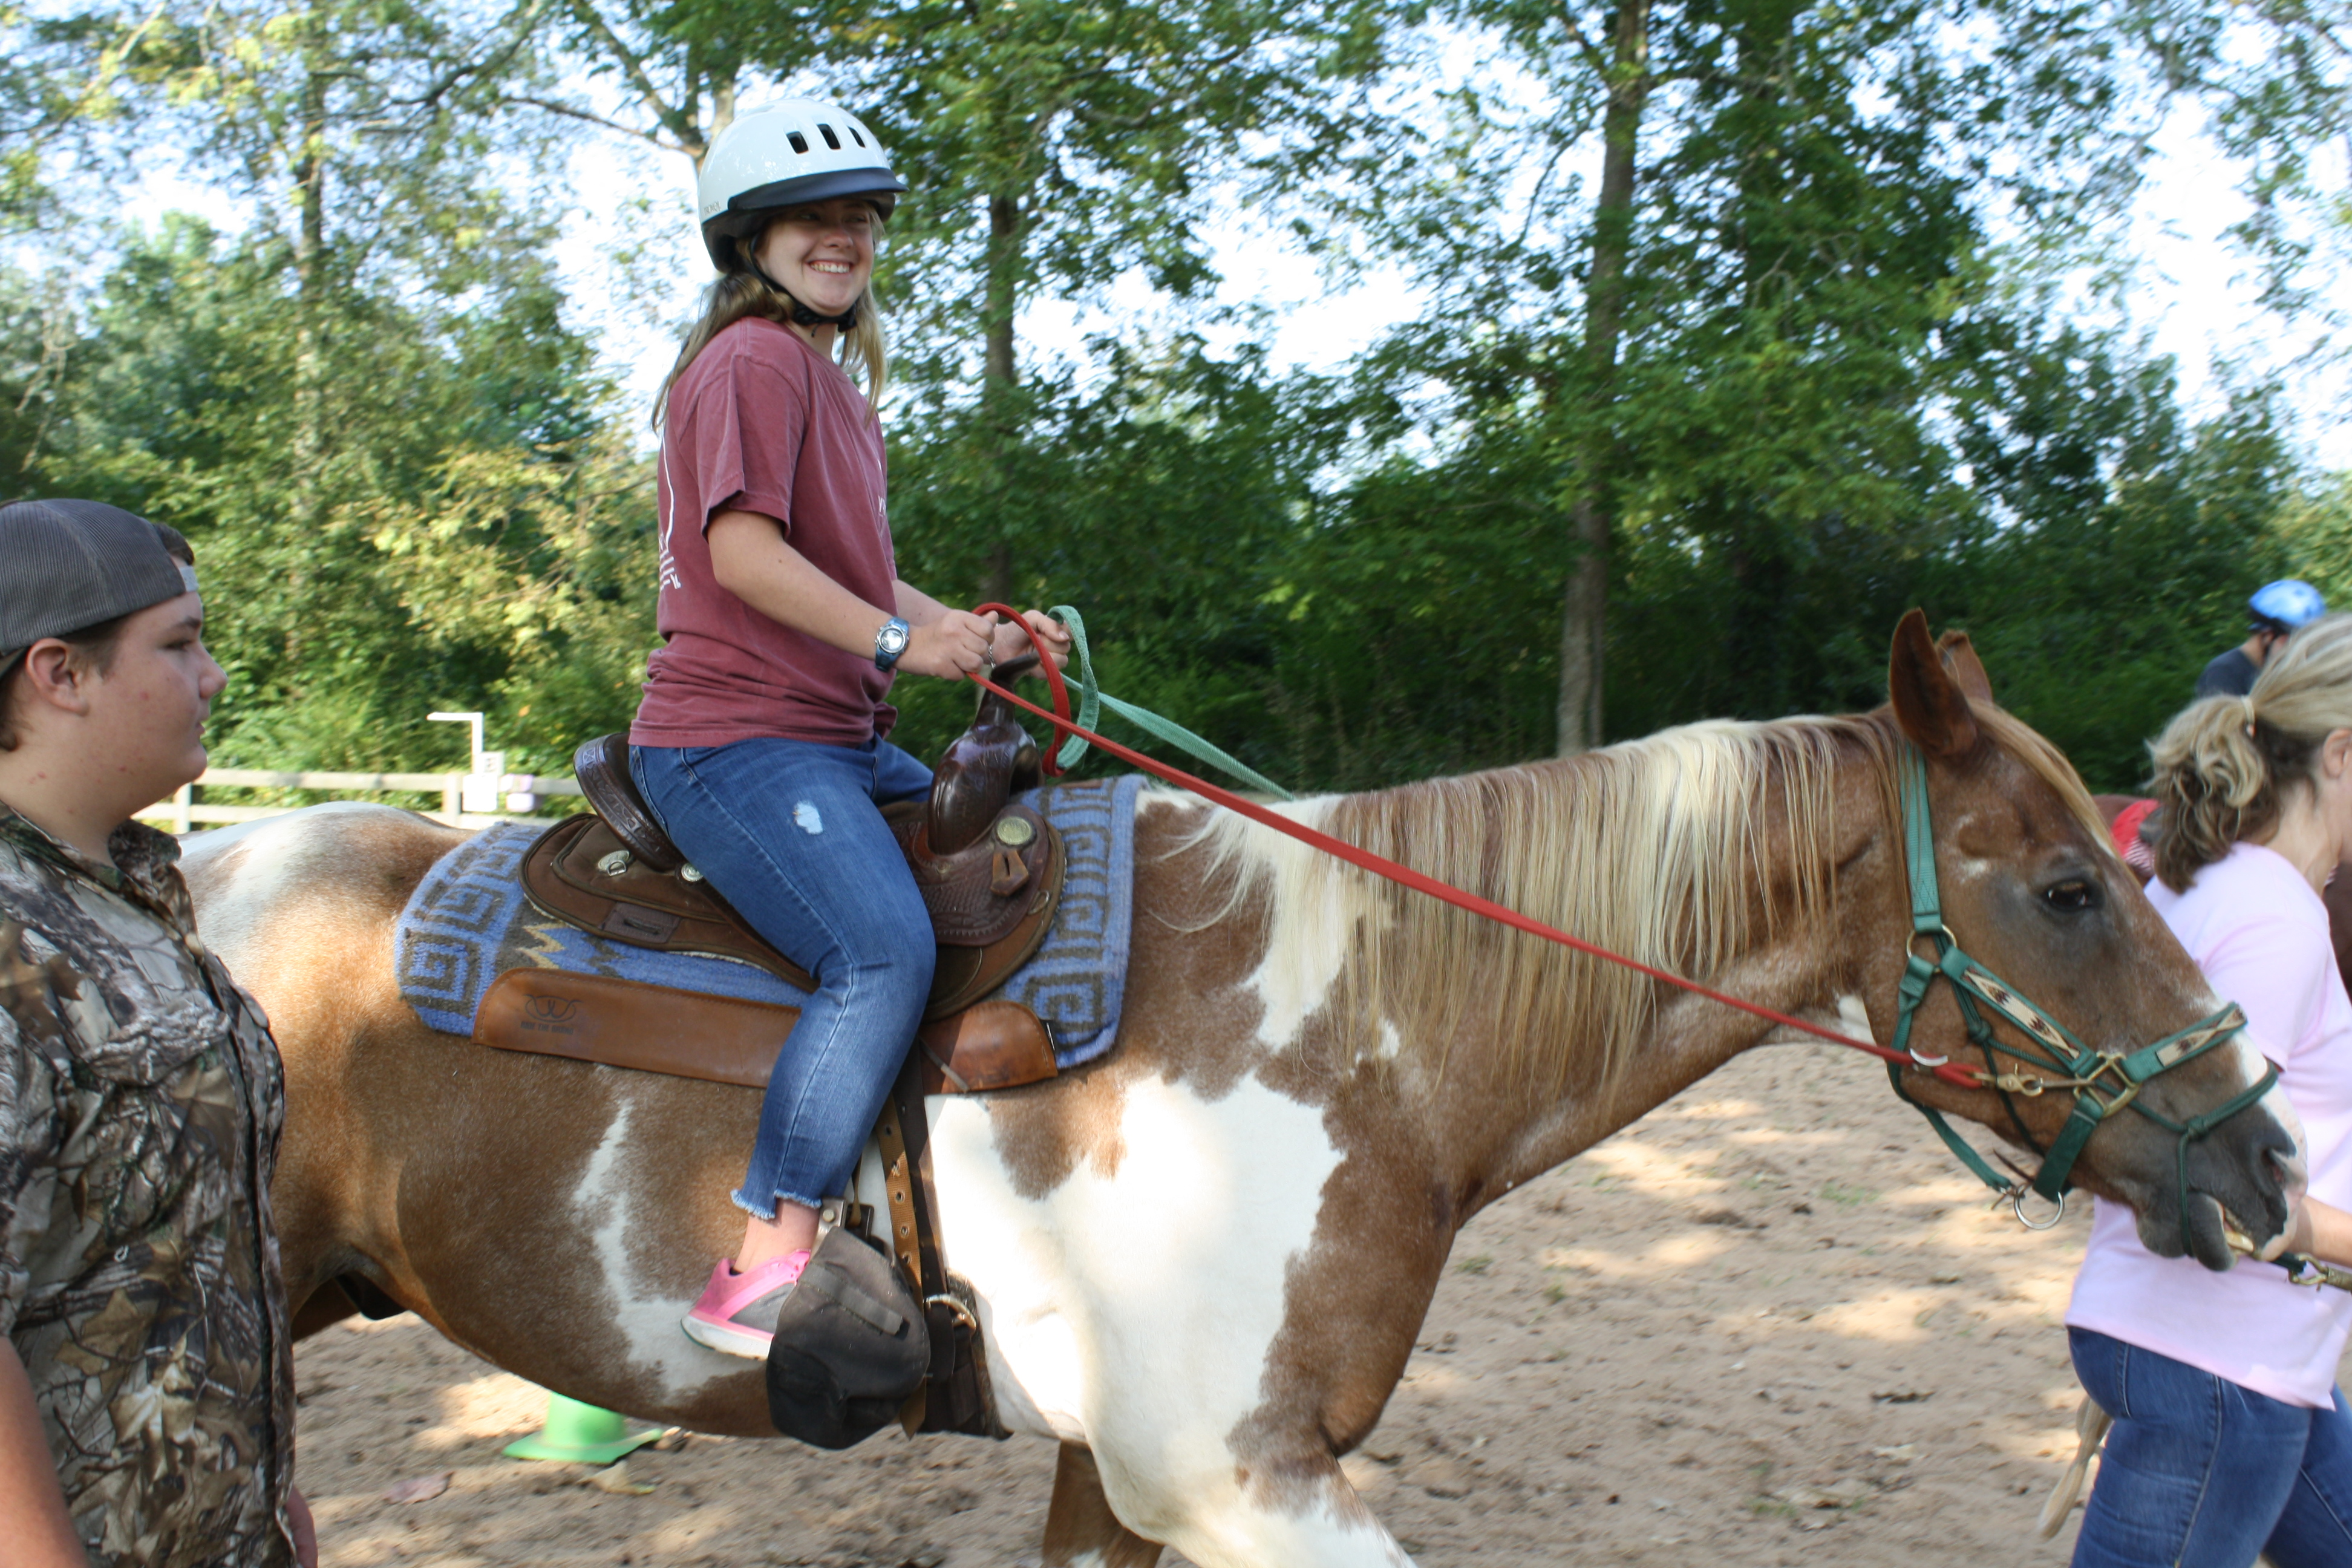 A smiling girl rides a horse.